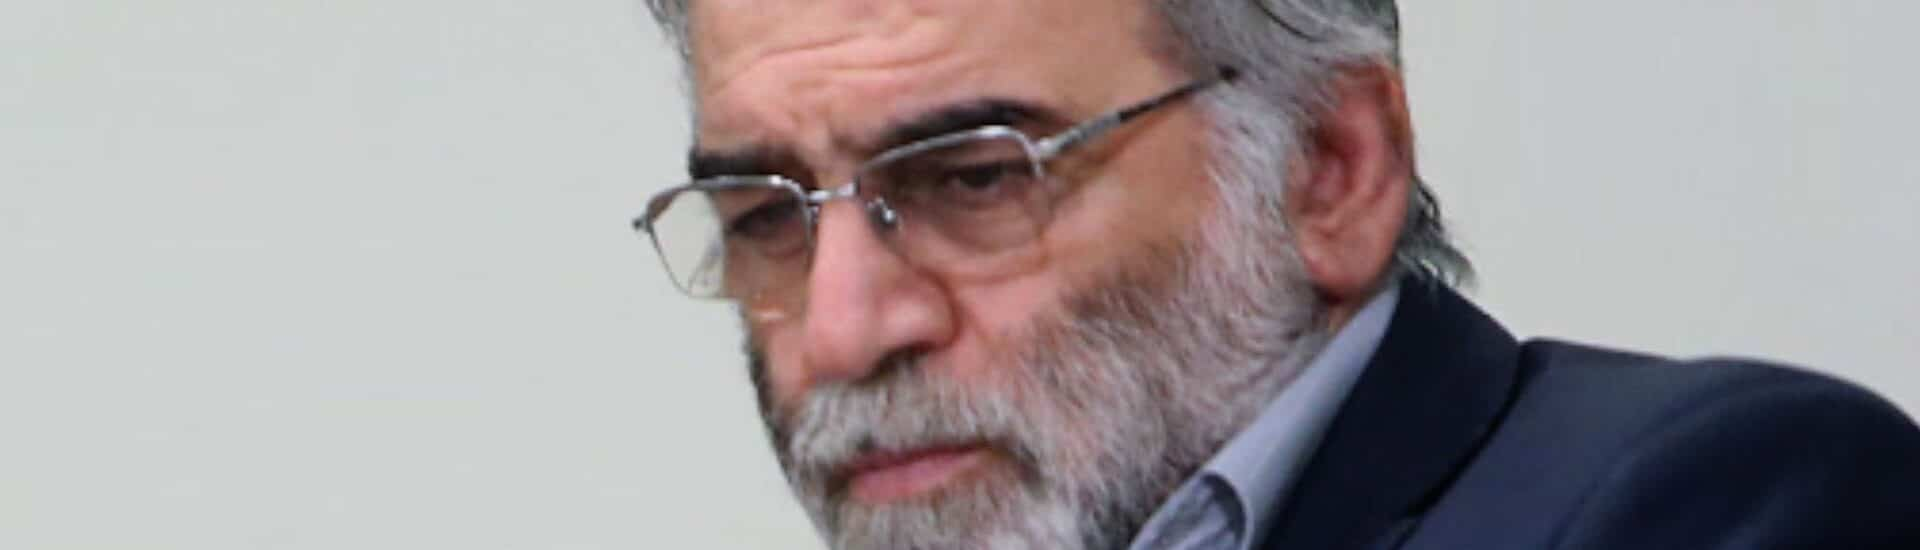 H δολοφονία του Ιρανού επιστήμονα Μοχσέν Φαχριζαντέ